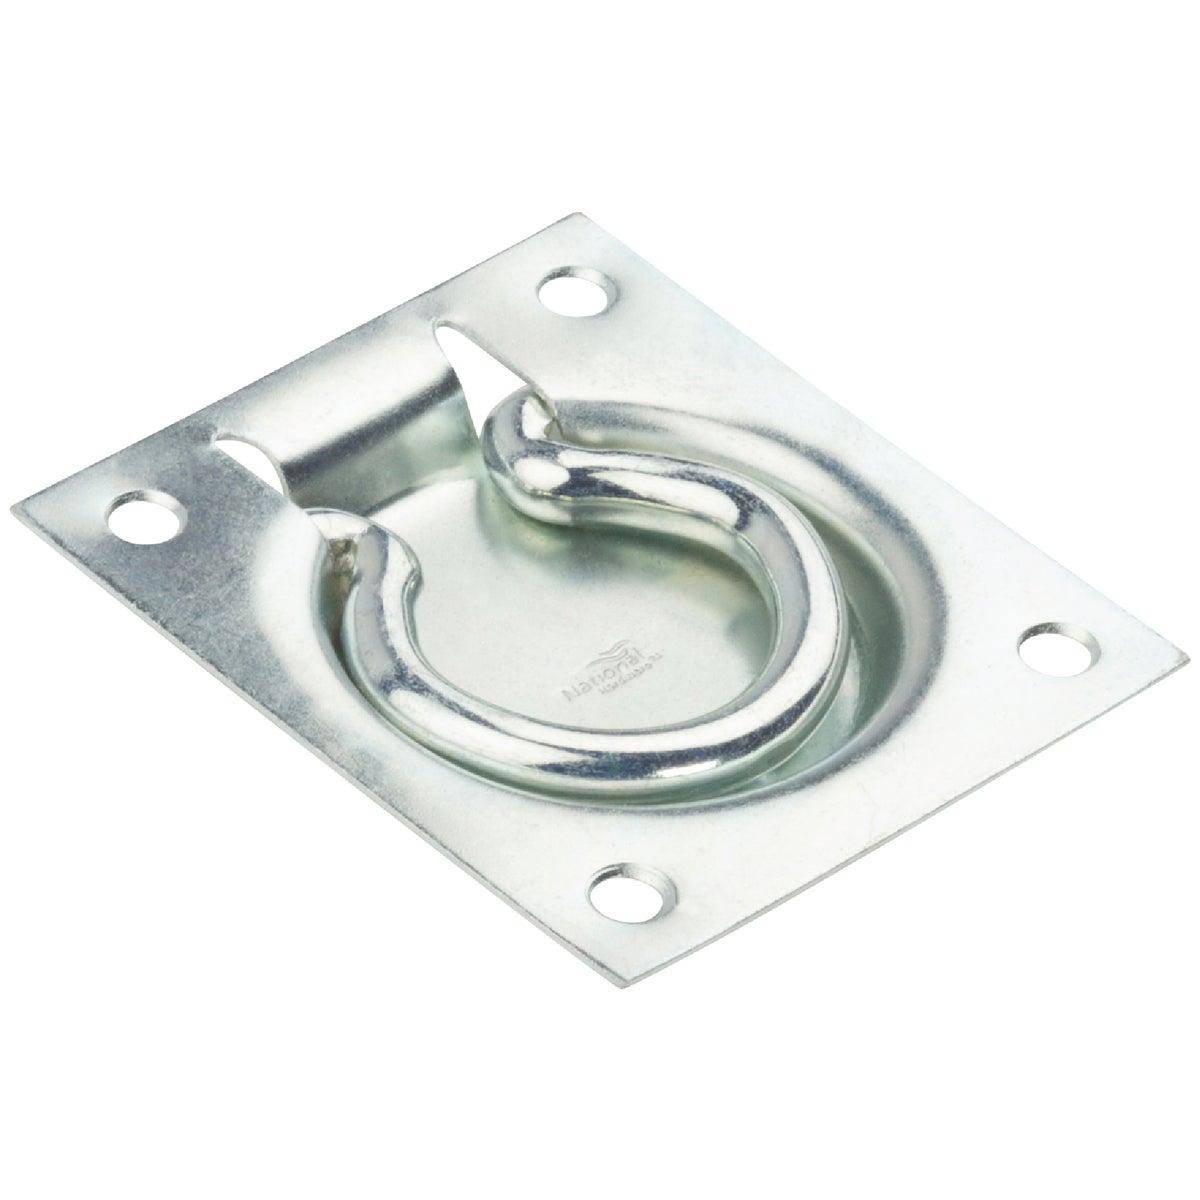 FLUSH RING PULL - N203752 by National Mfg Co